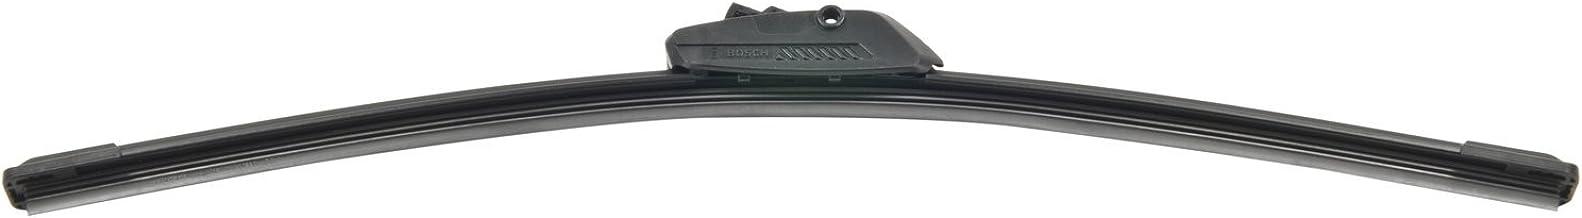 "Bosch Automotive Bosch 18-CA / 3397006504E7W Clear Advantage Beam Wiper Blade - 18"" (Pack of 1)"